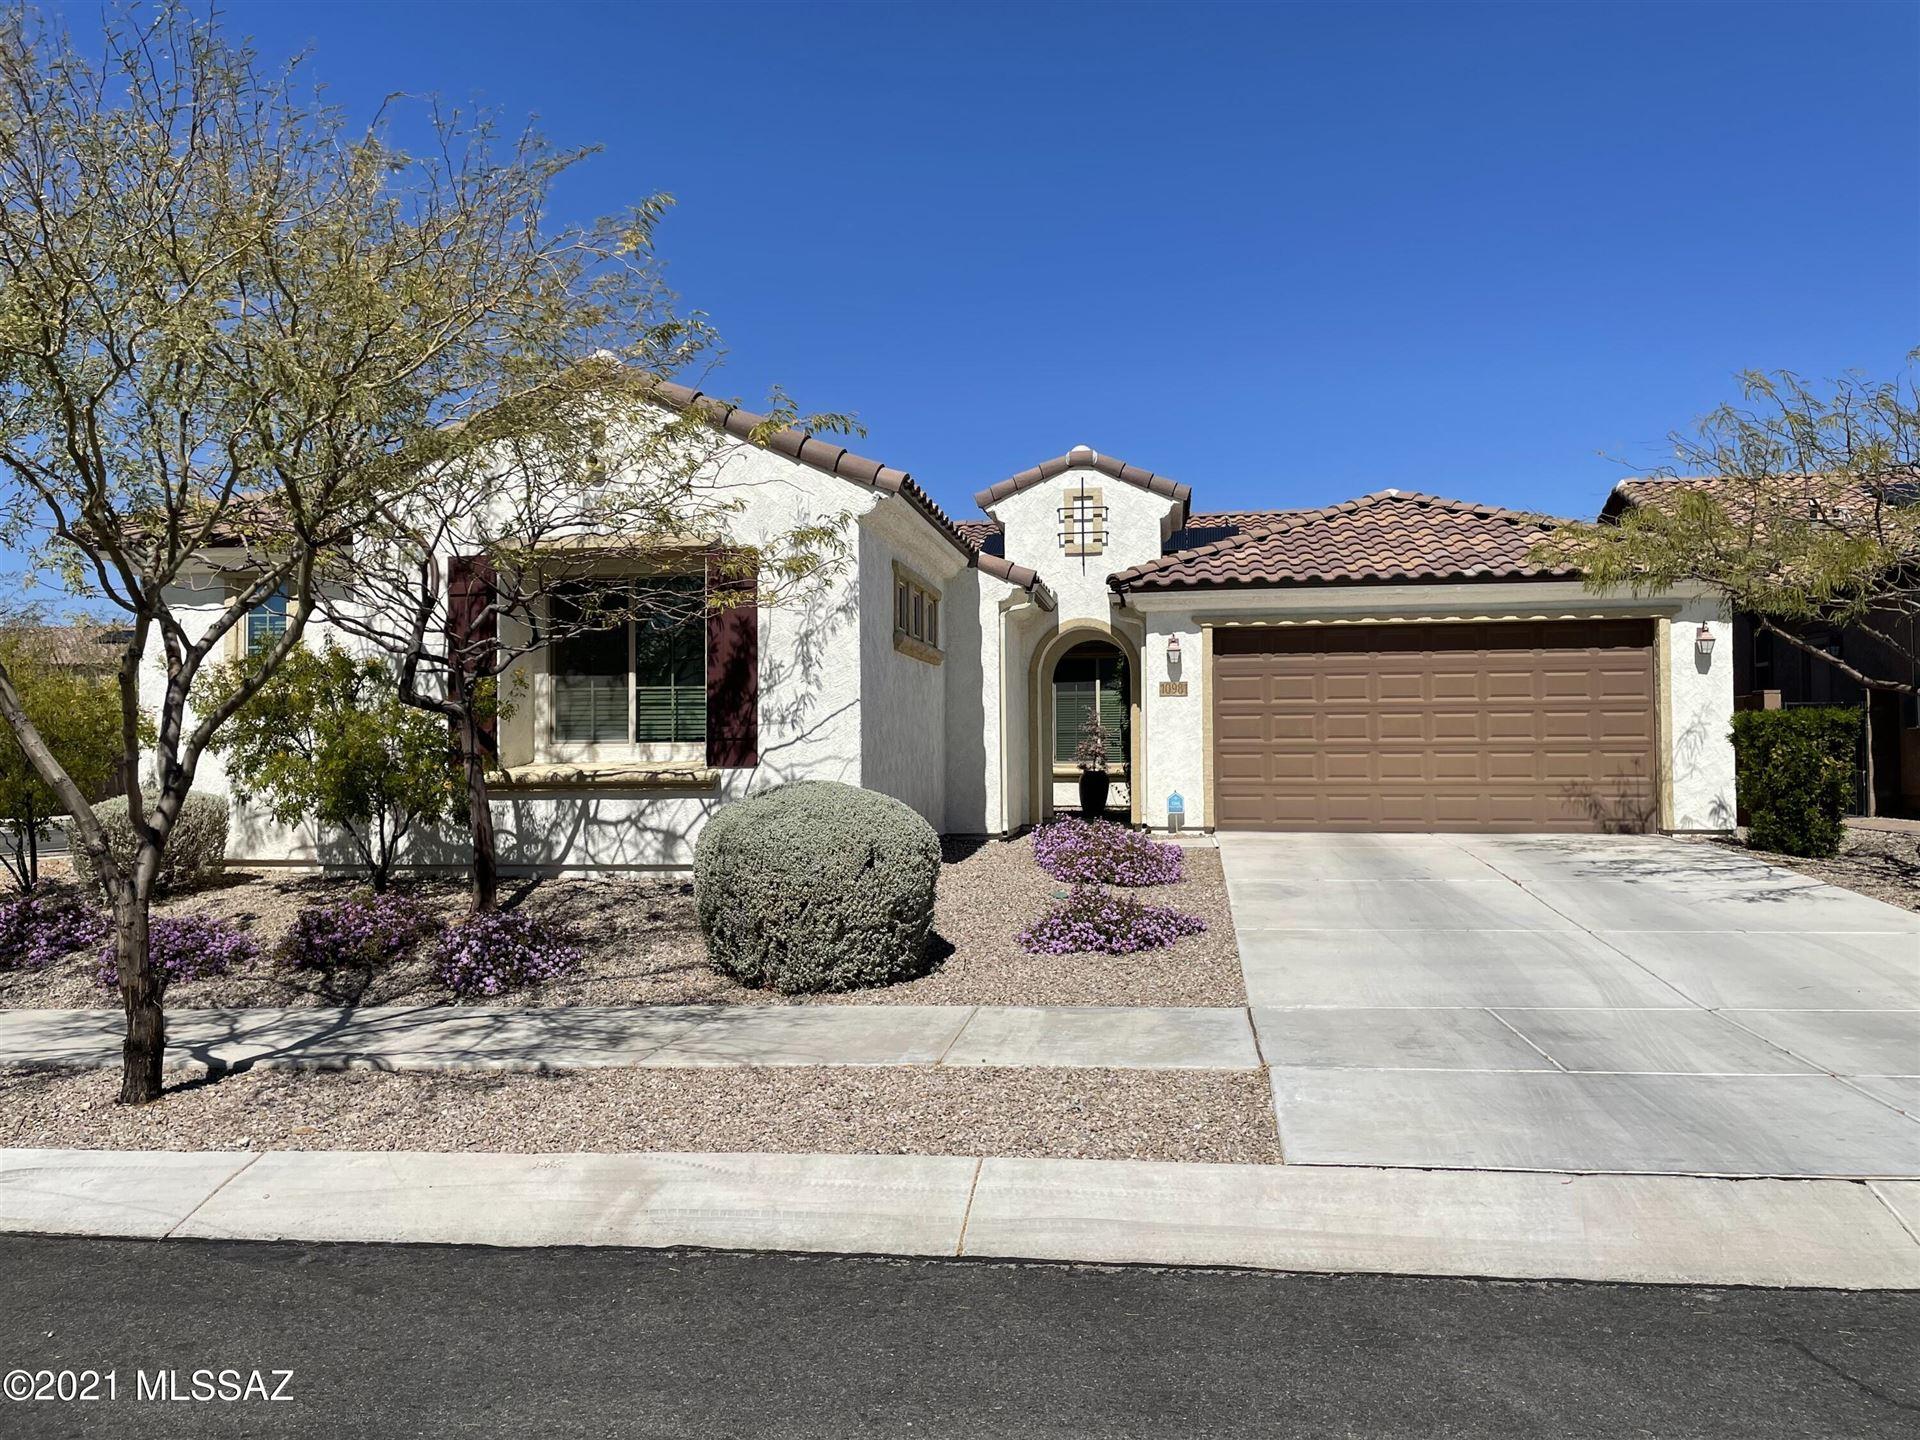 10981 E Lone Pine Place, Tucson, AZ 85747 - MLS#: 22111852